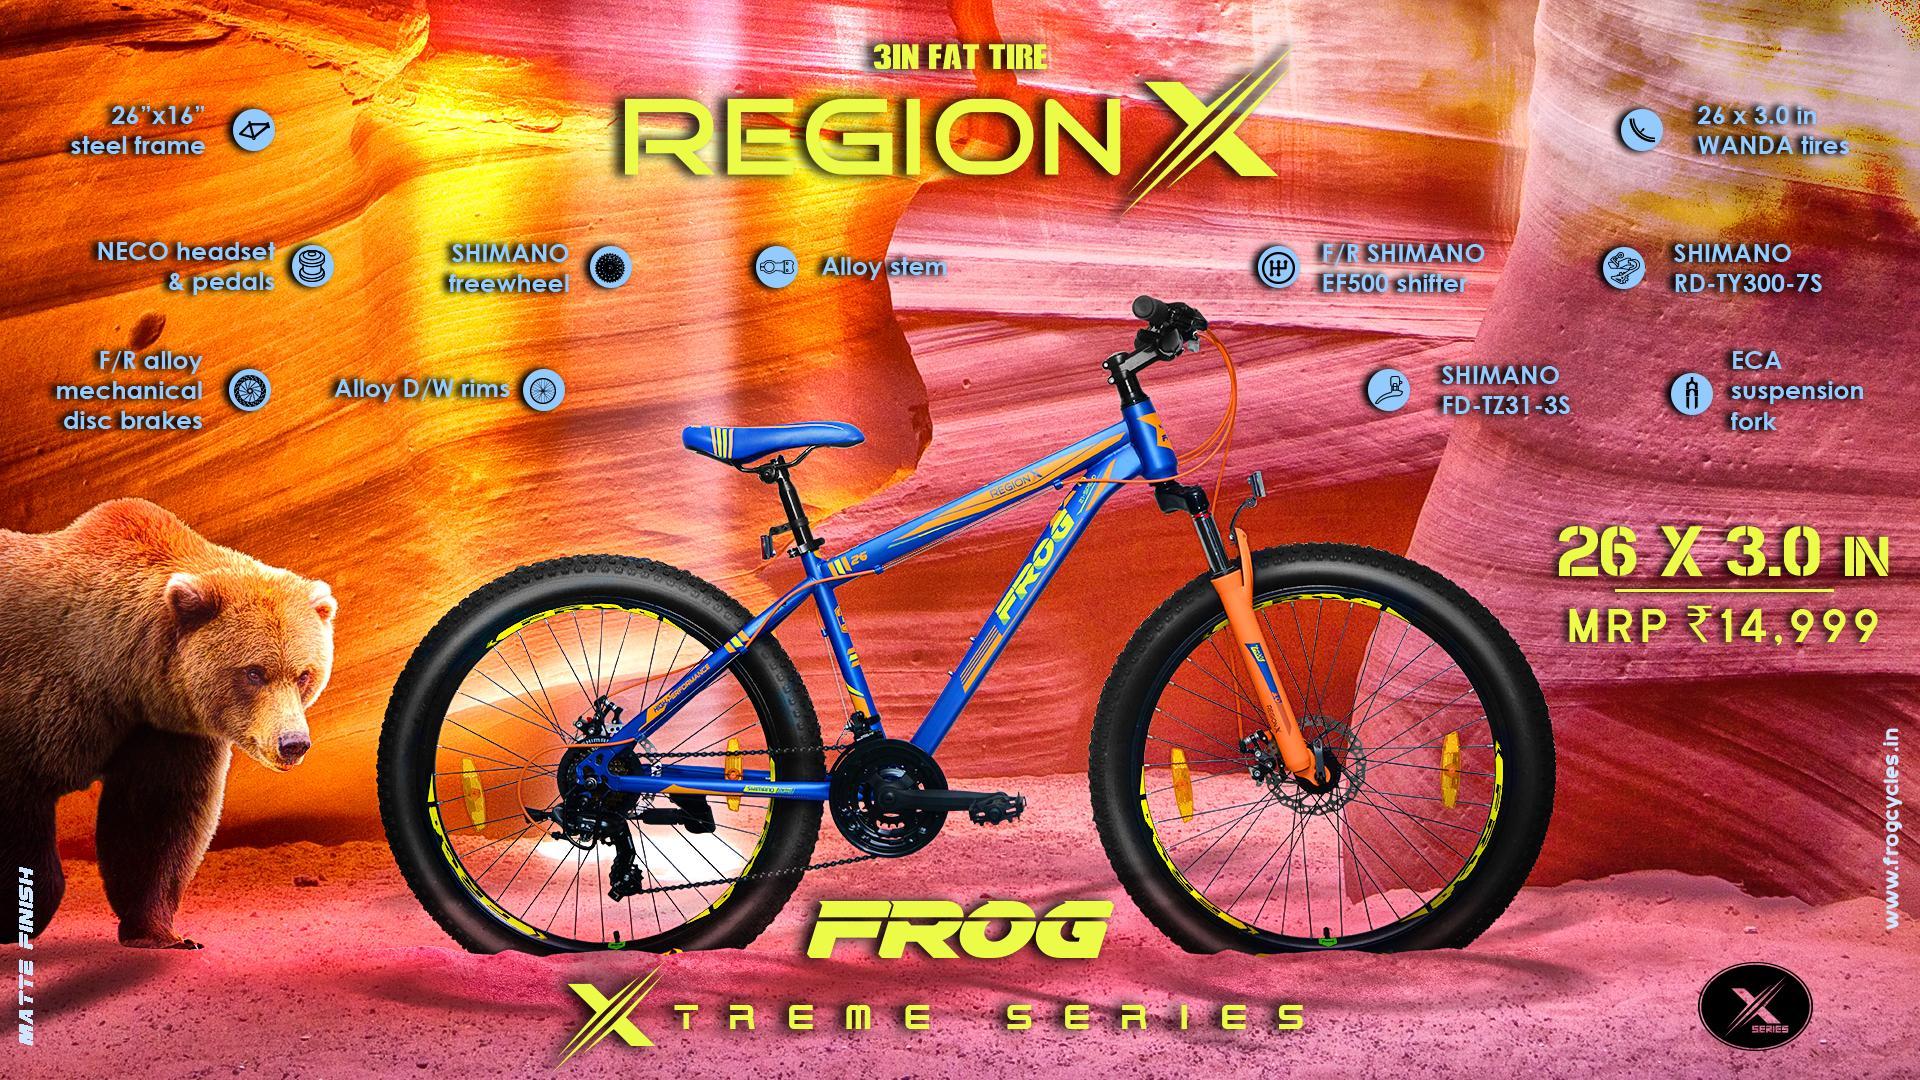 Region X 26 3 0 image 4